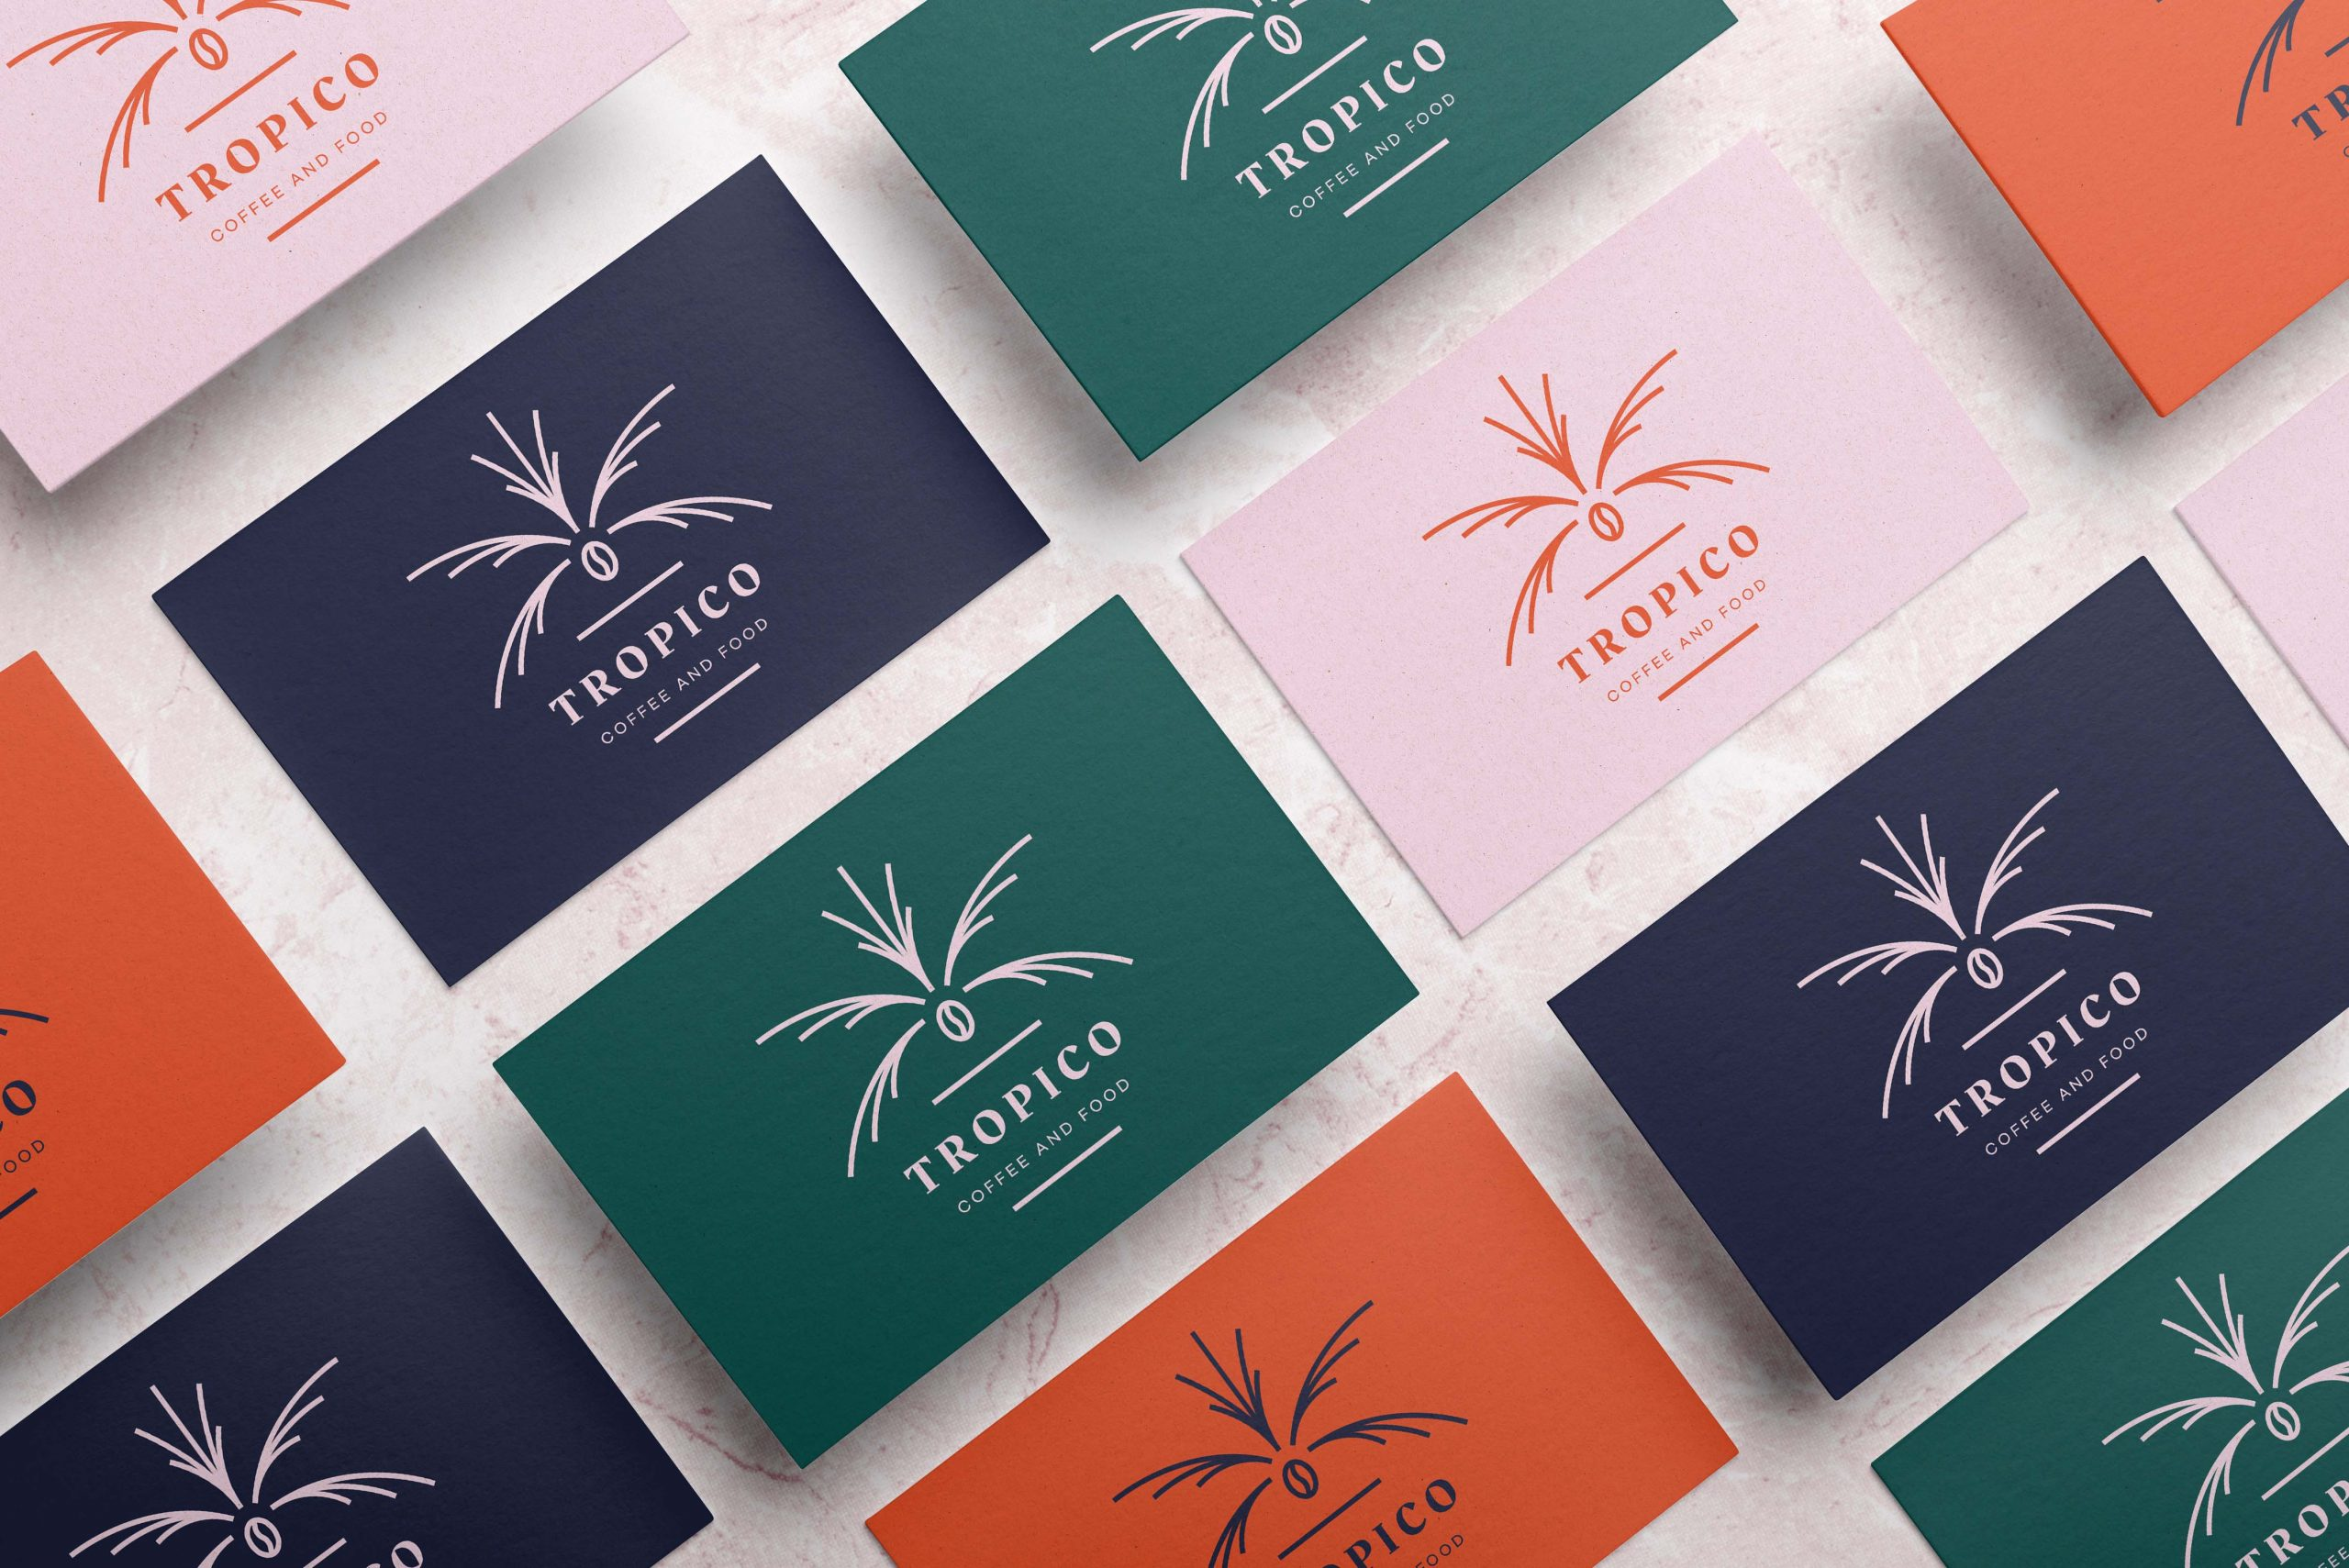 design visitekaartje Tropico koffiebar